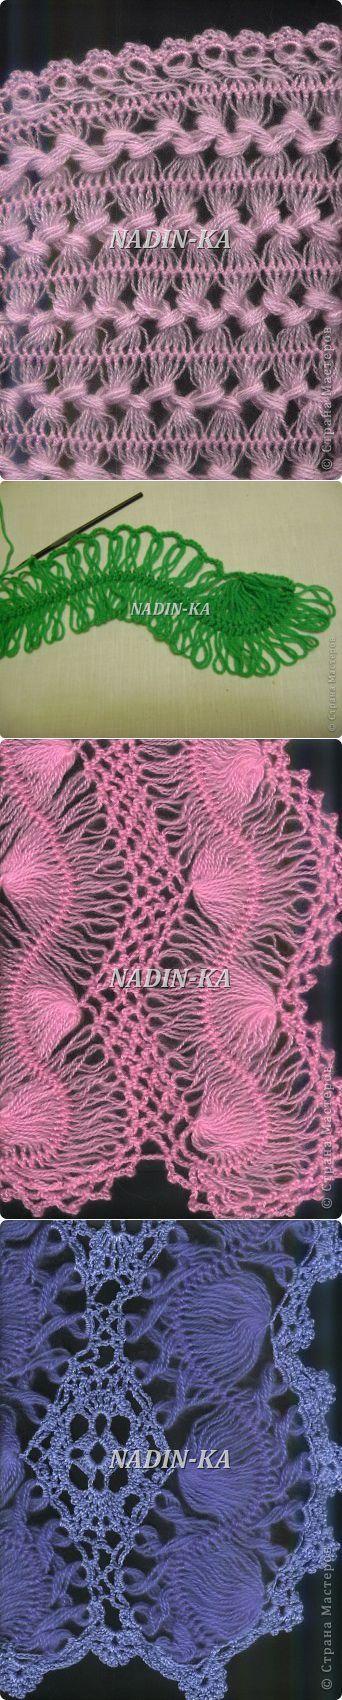 МК вязание на вилке. 1   Страна Мастеров   вязание.   Постила